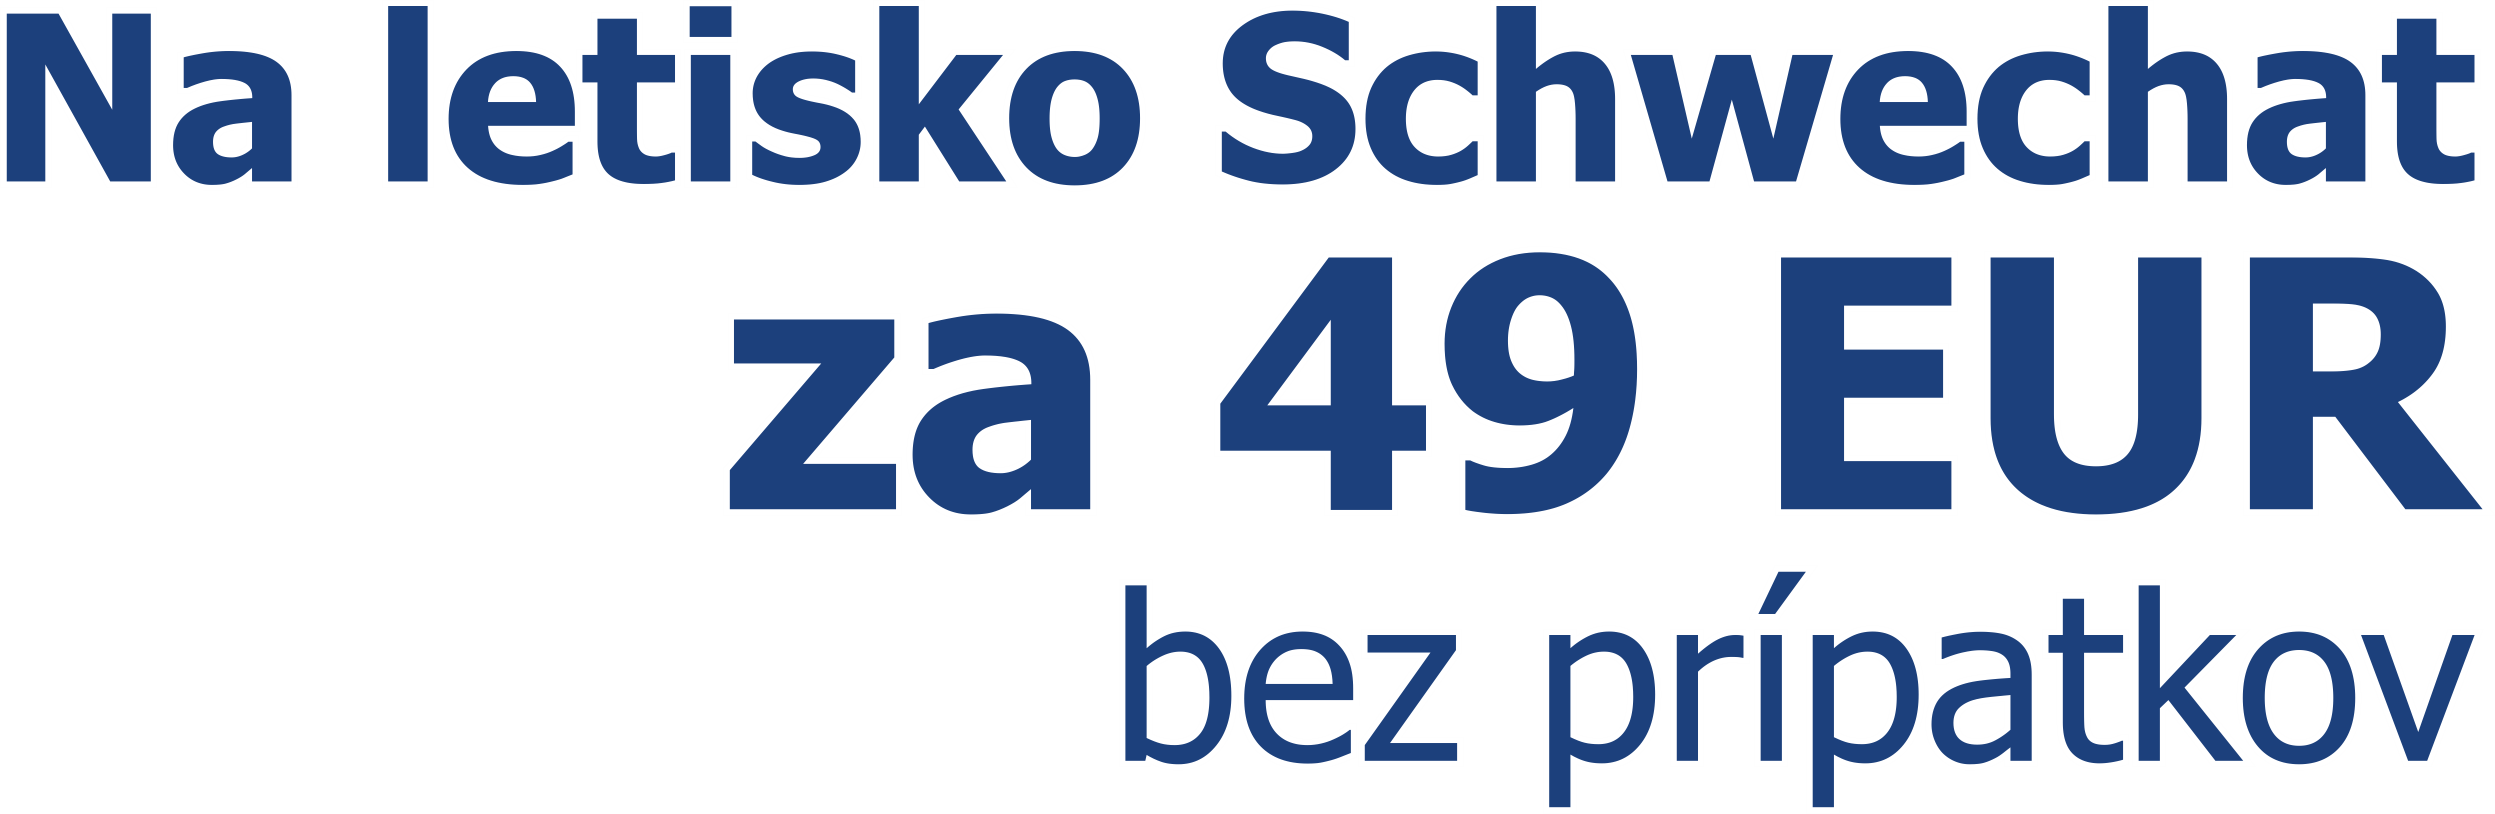 def8e7d6b7e0 Schwechatexpress - preprava na letisko Schwechat